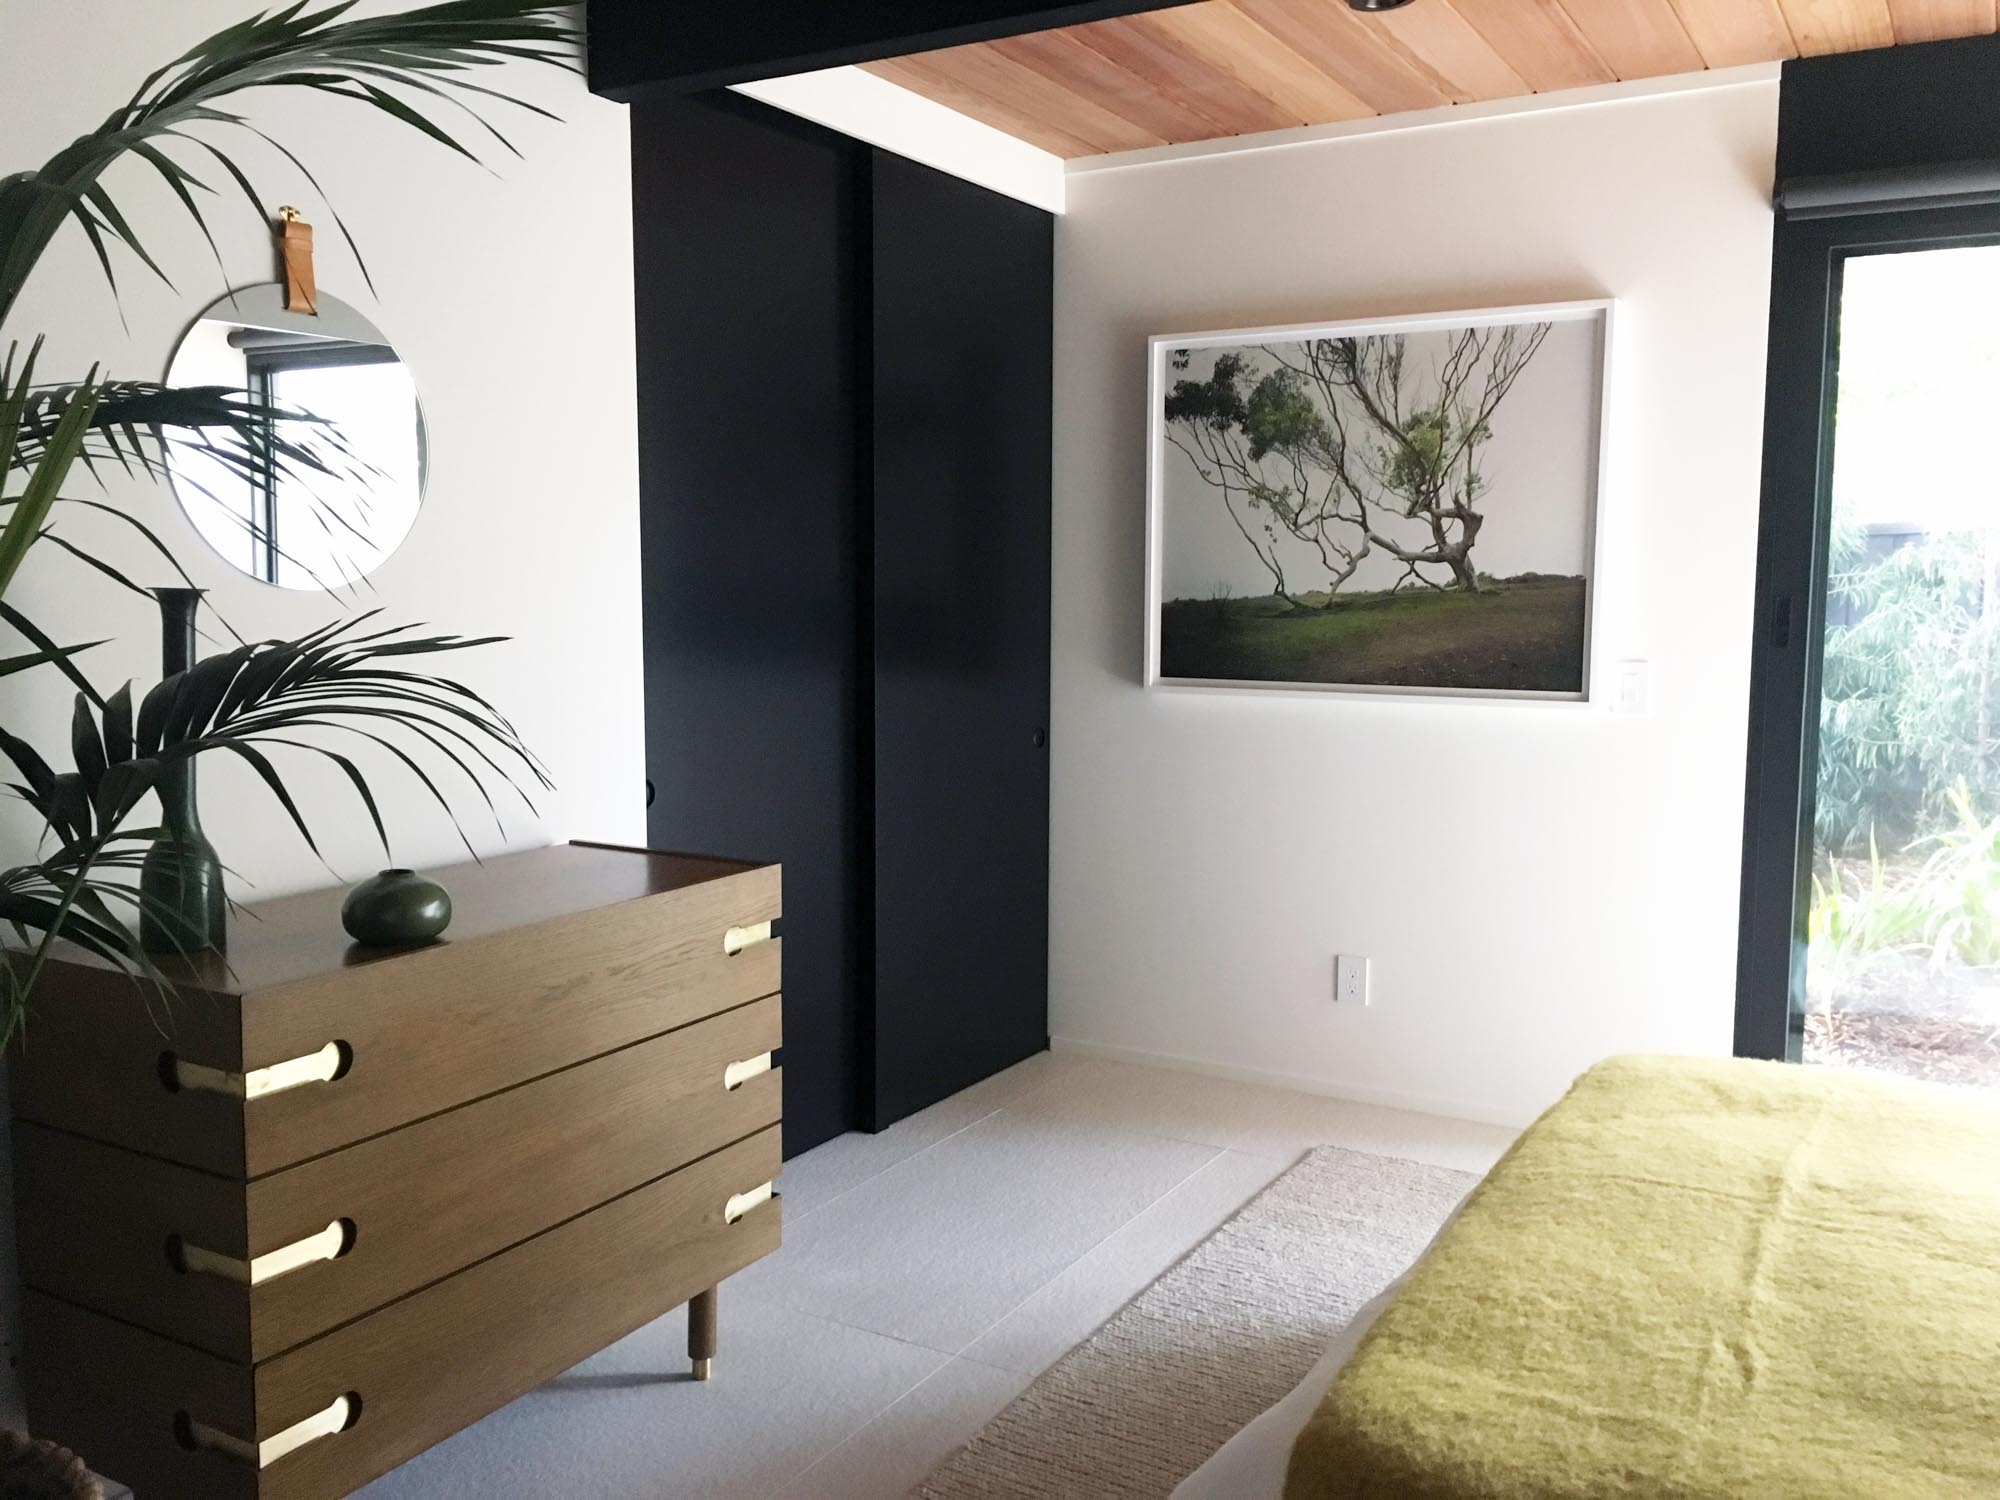 Designer: Jeanne Moeschler